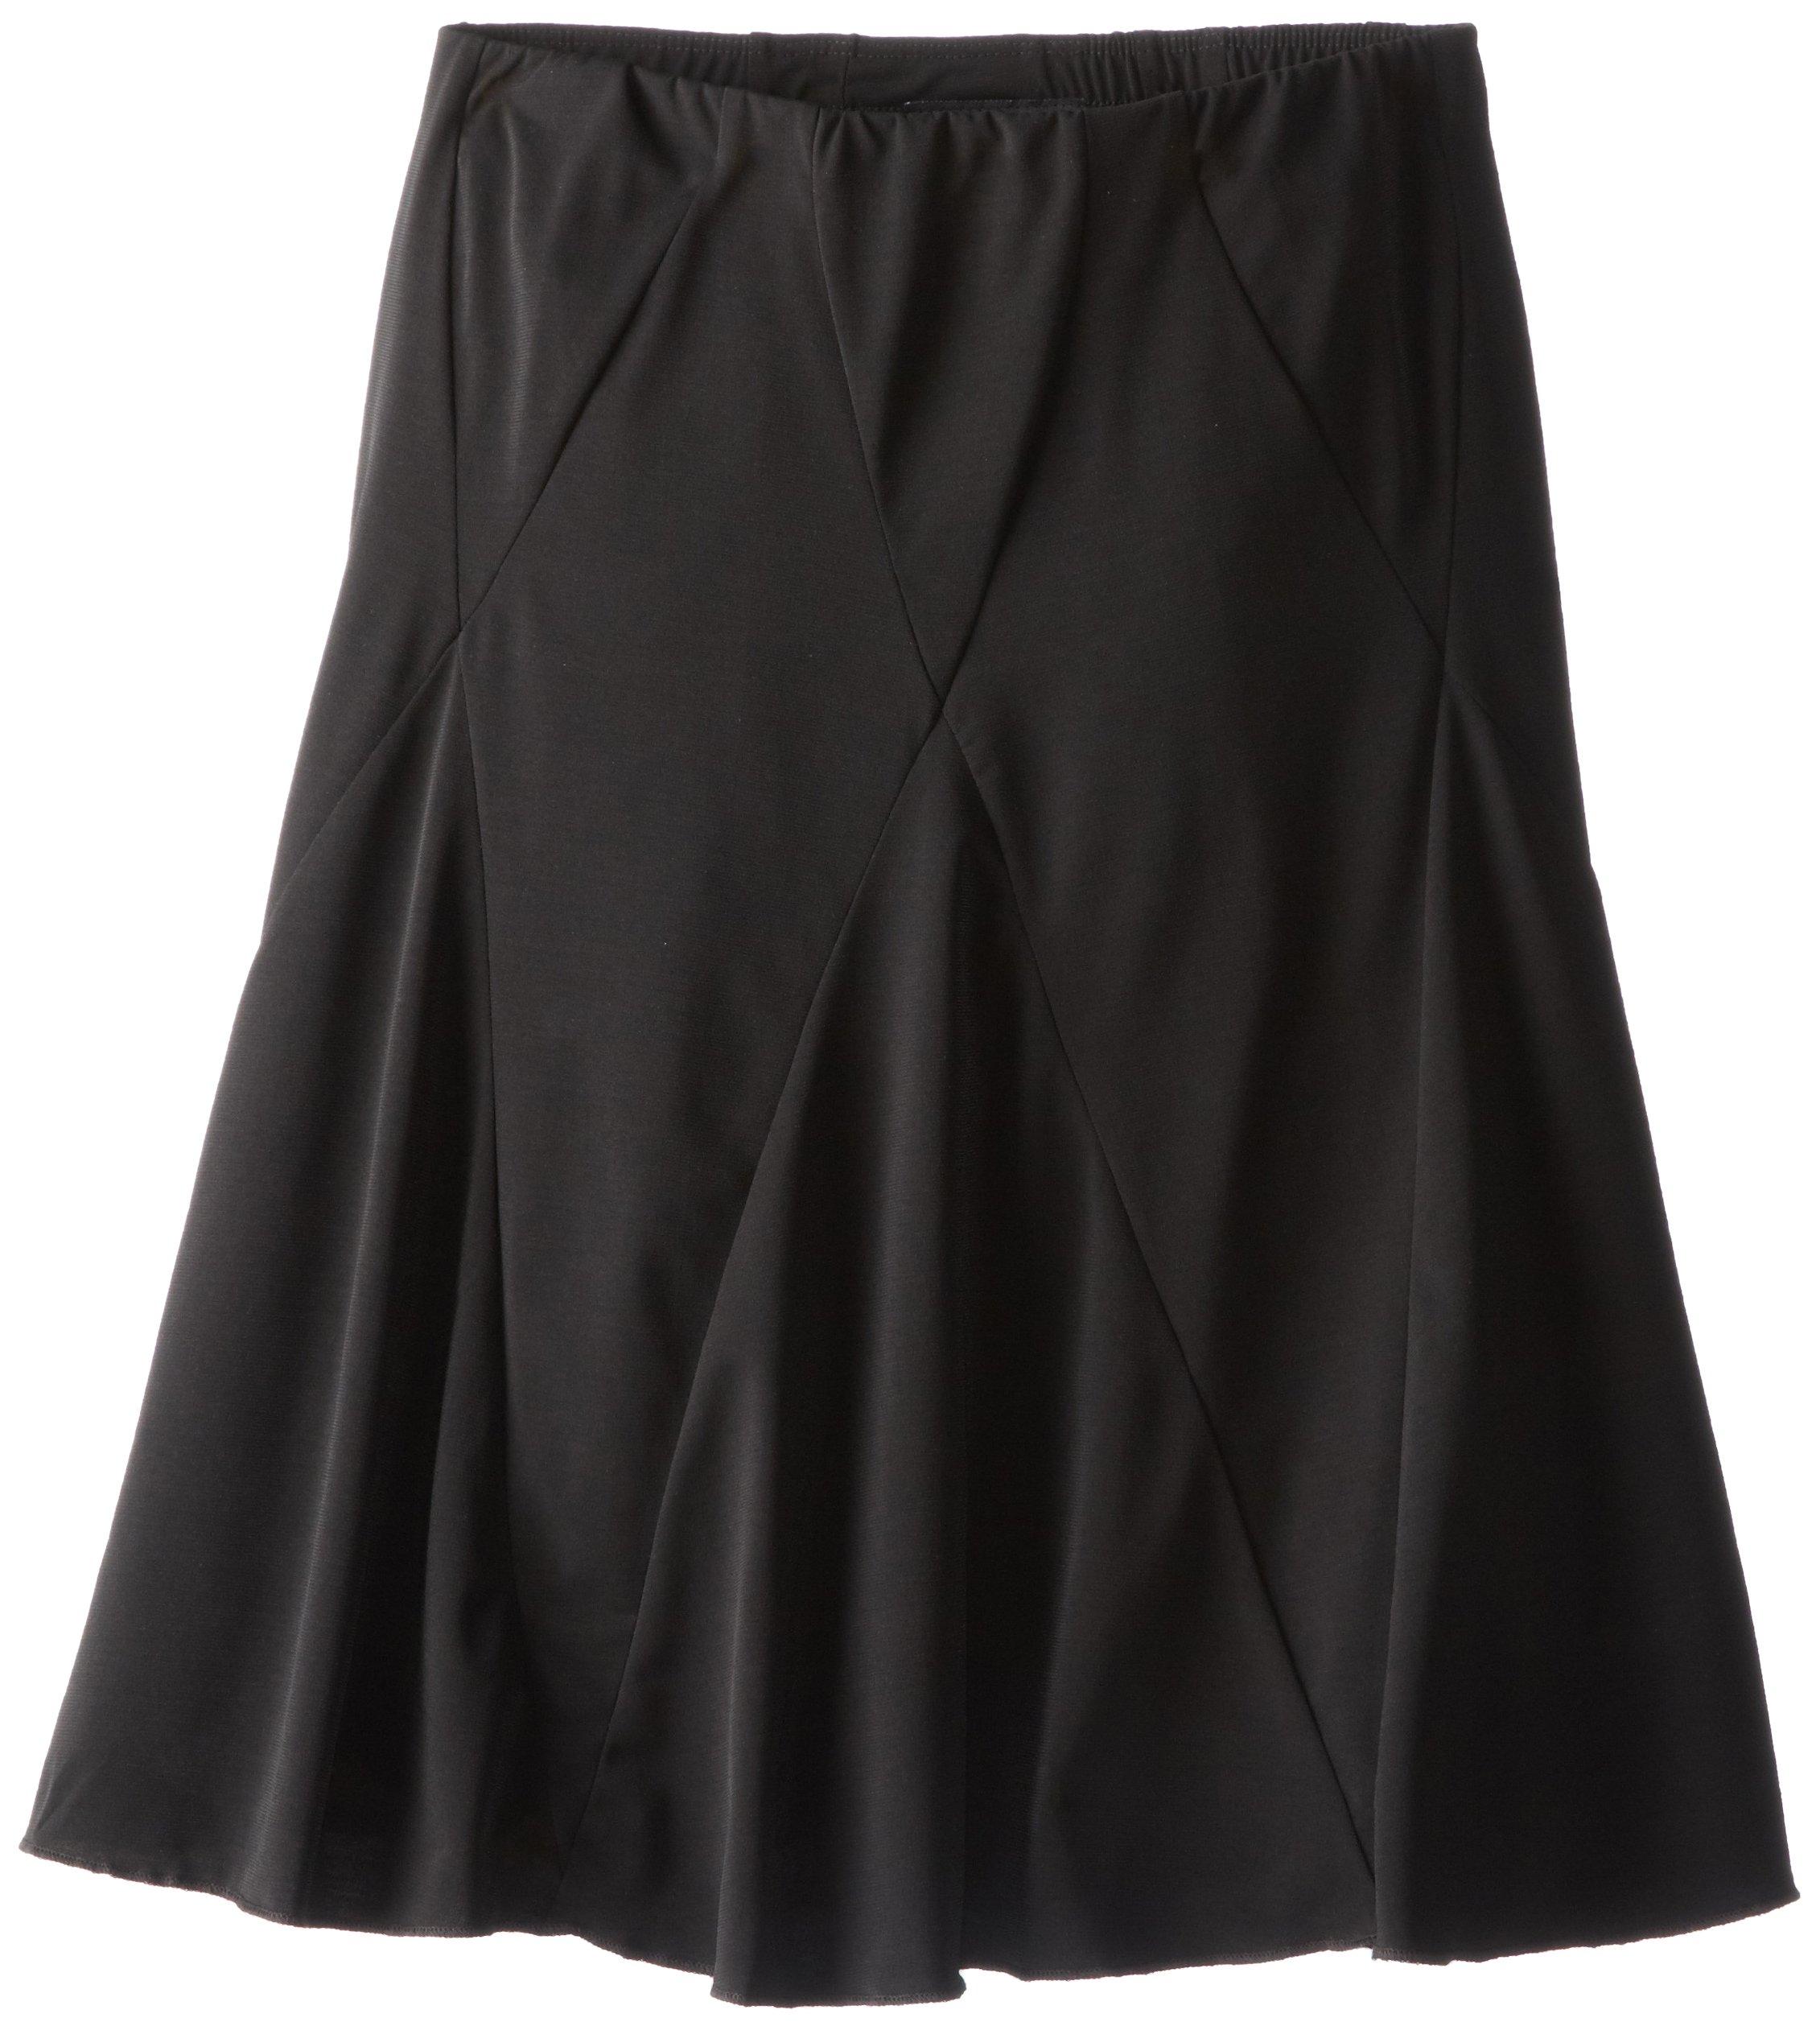 Amy Byer Big Girls' Knit Seamed Skirt, Black, Medium